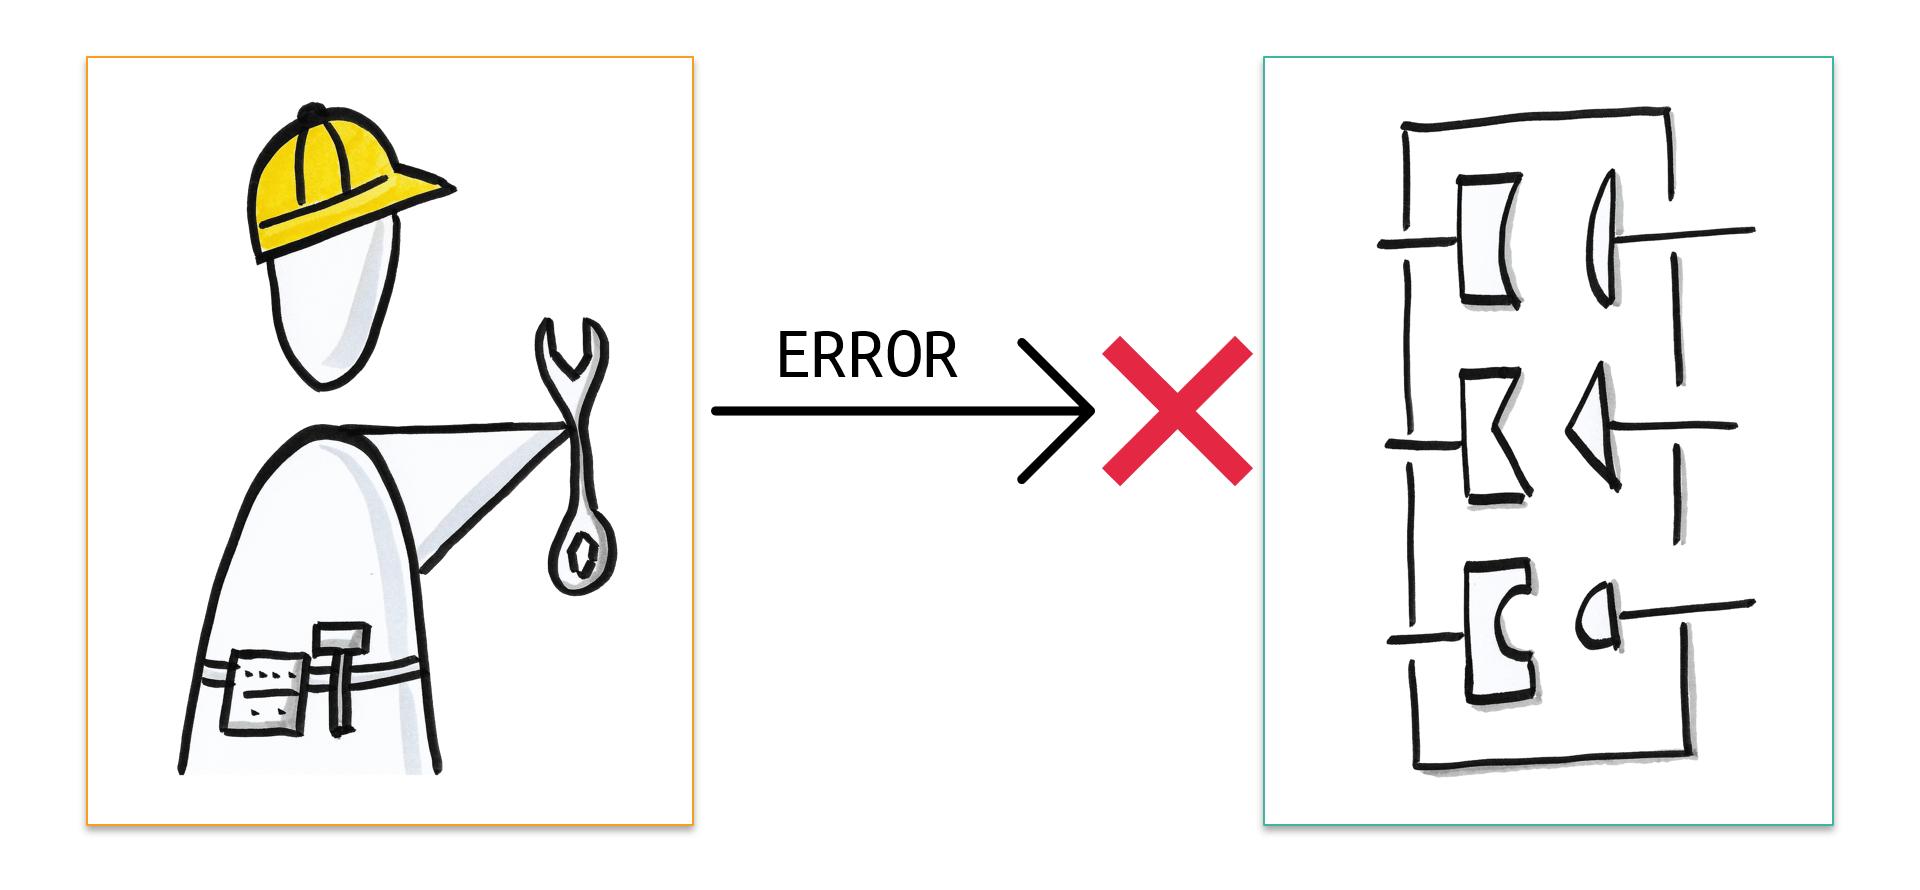 External Task Error